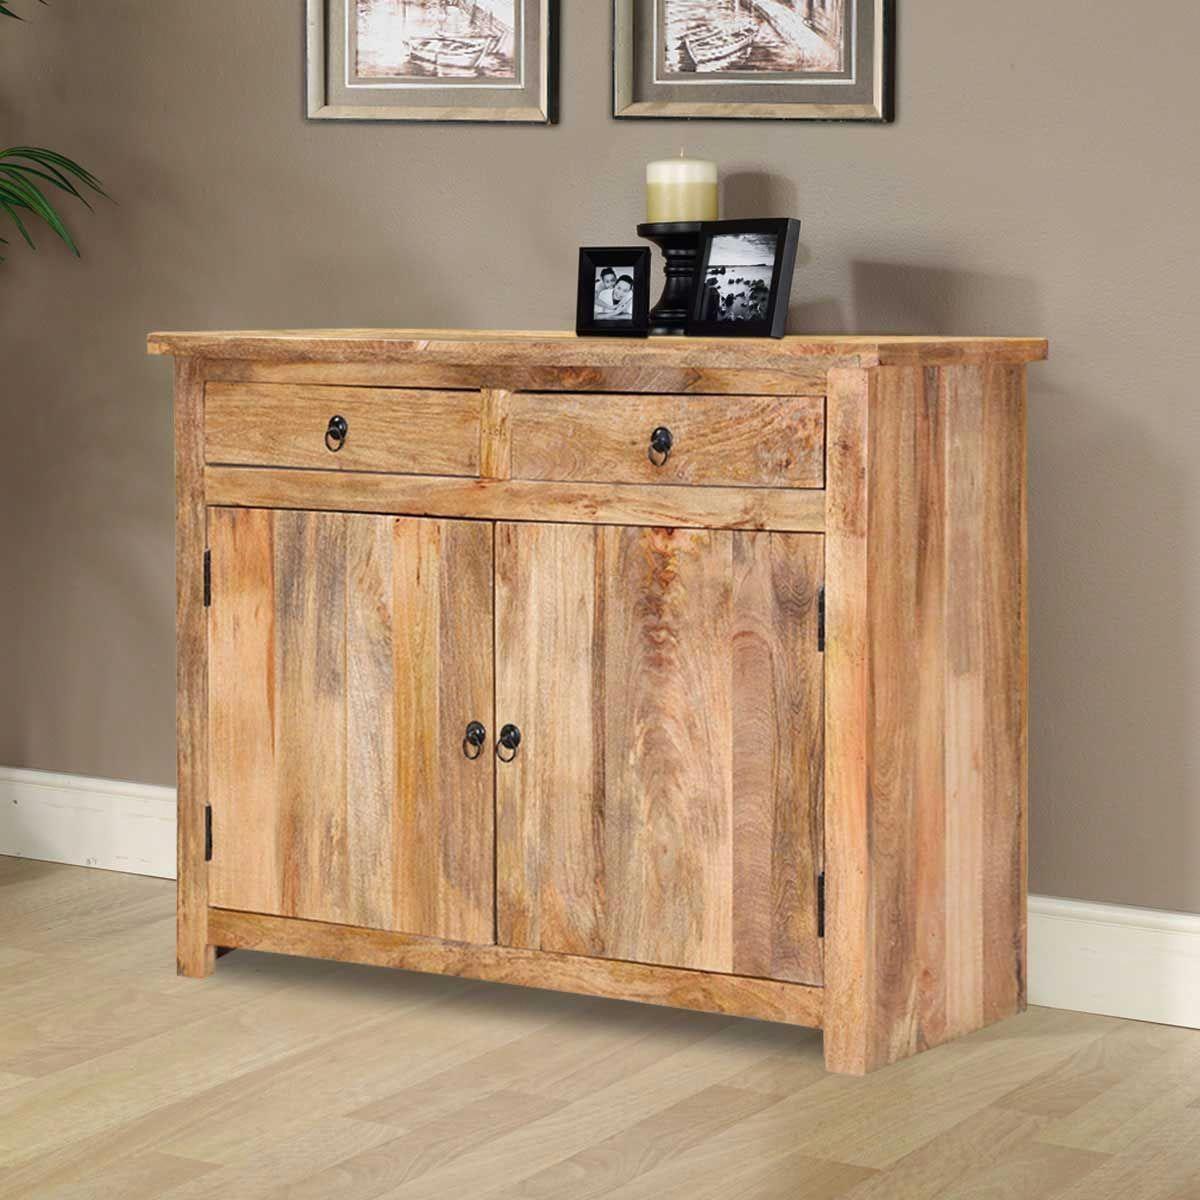 Waldo Rustic Mango Wood 2 Drawer Storage Buffet Cabinet #BathroomCabinetWall